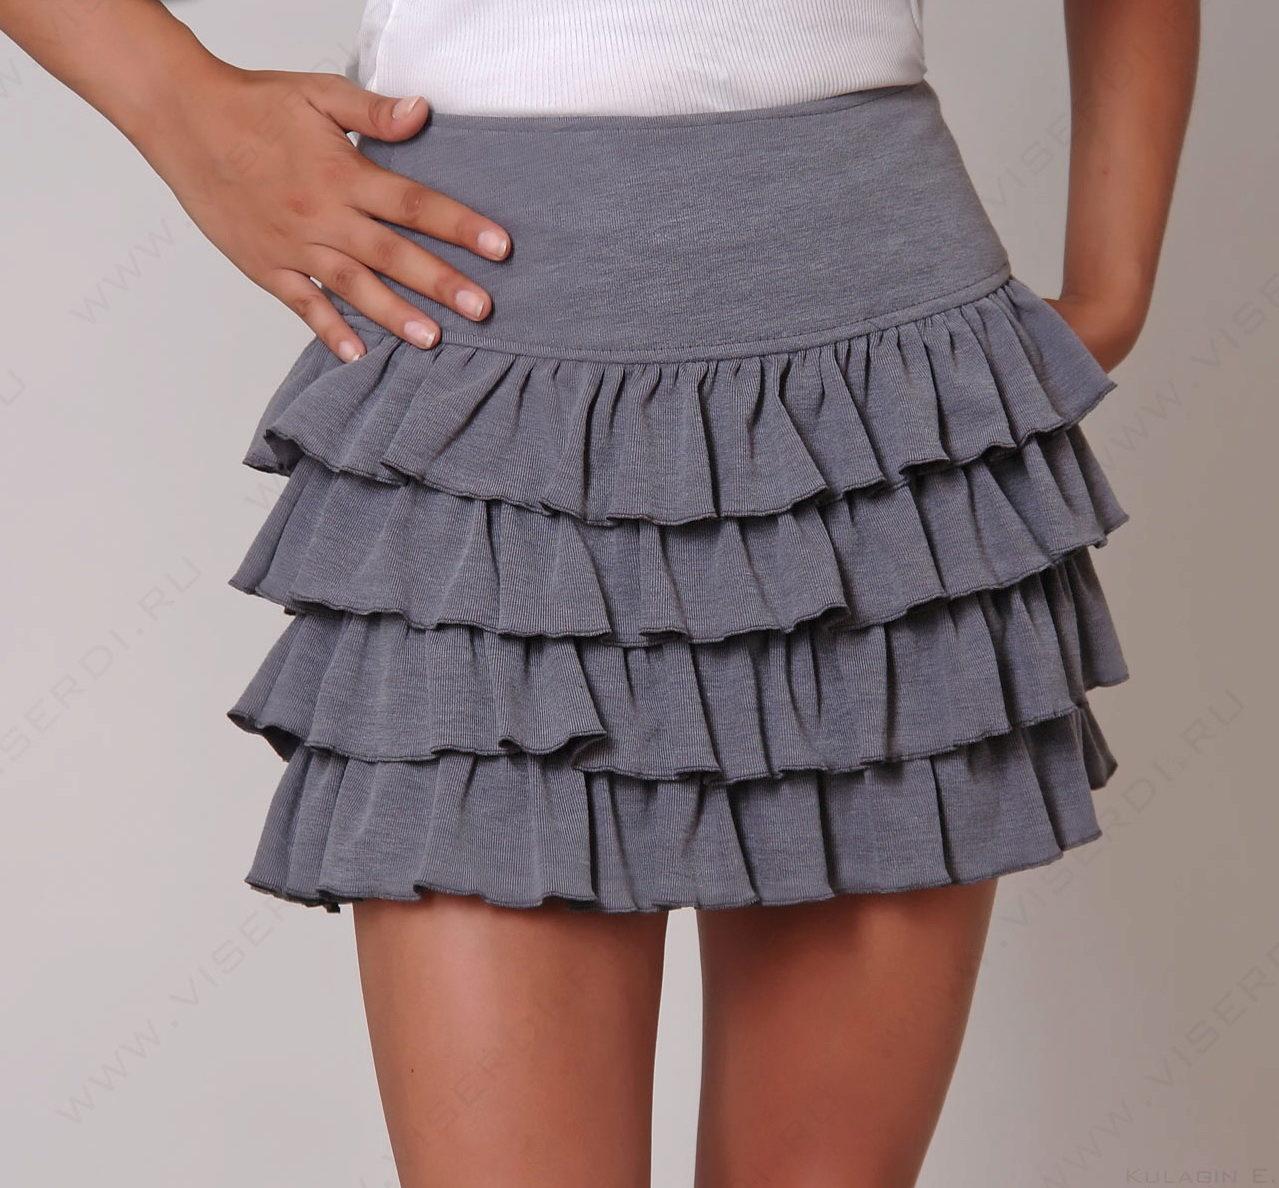 35f69cd874c Юбки на резинке (63 фото)  с чем носить юбку с широкой резинкой